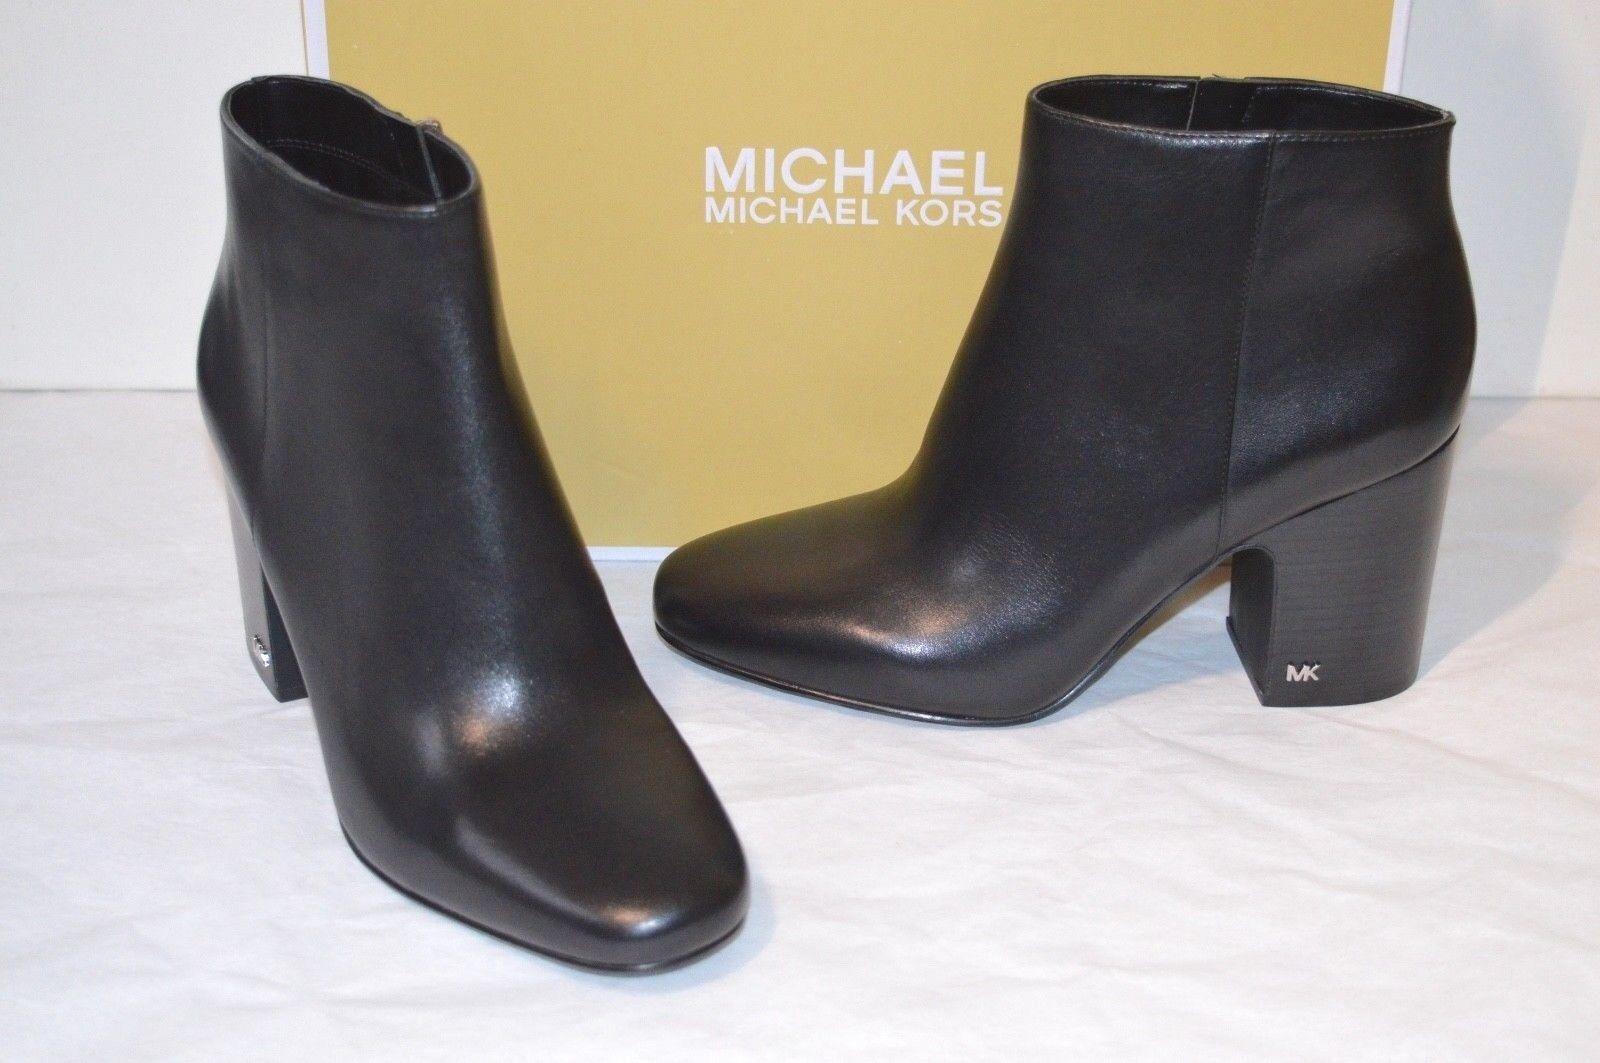 0b0e62bee9 Women's Michael Kors Elaine Bootie Block Heel Ankle BOOTS Leather Black  Size 8